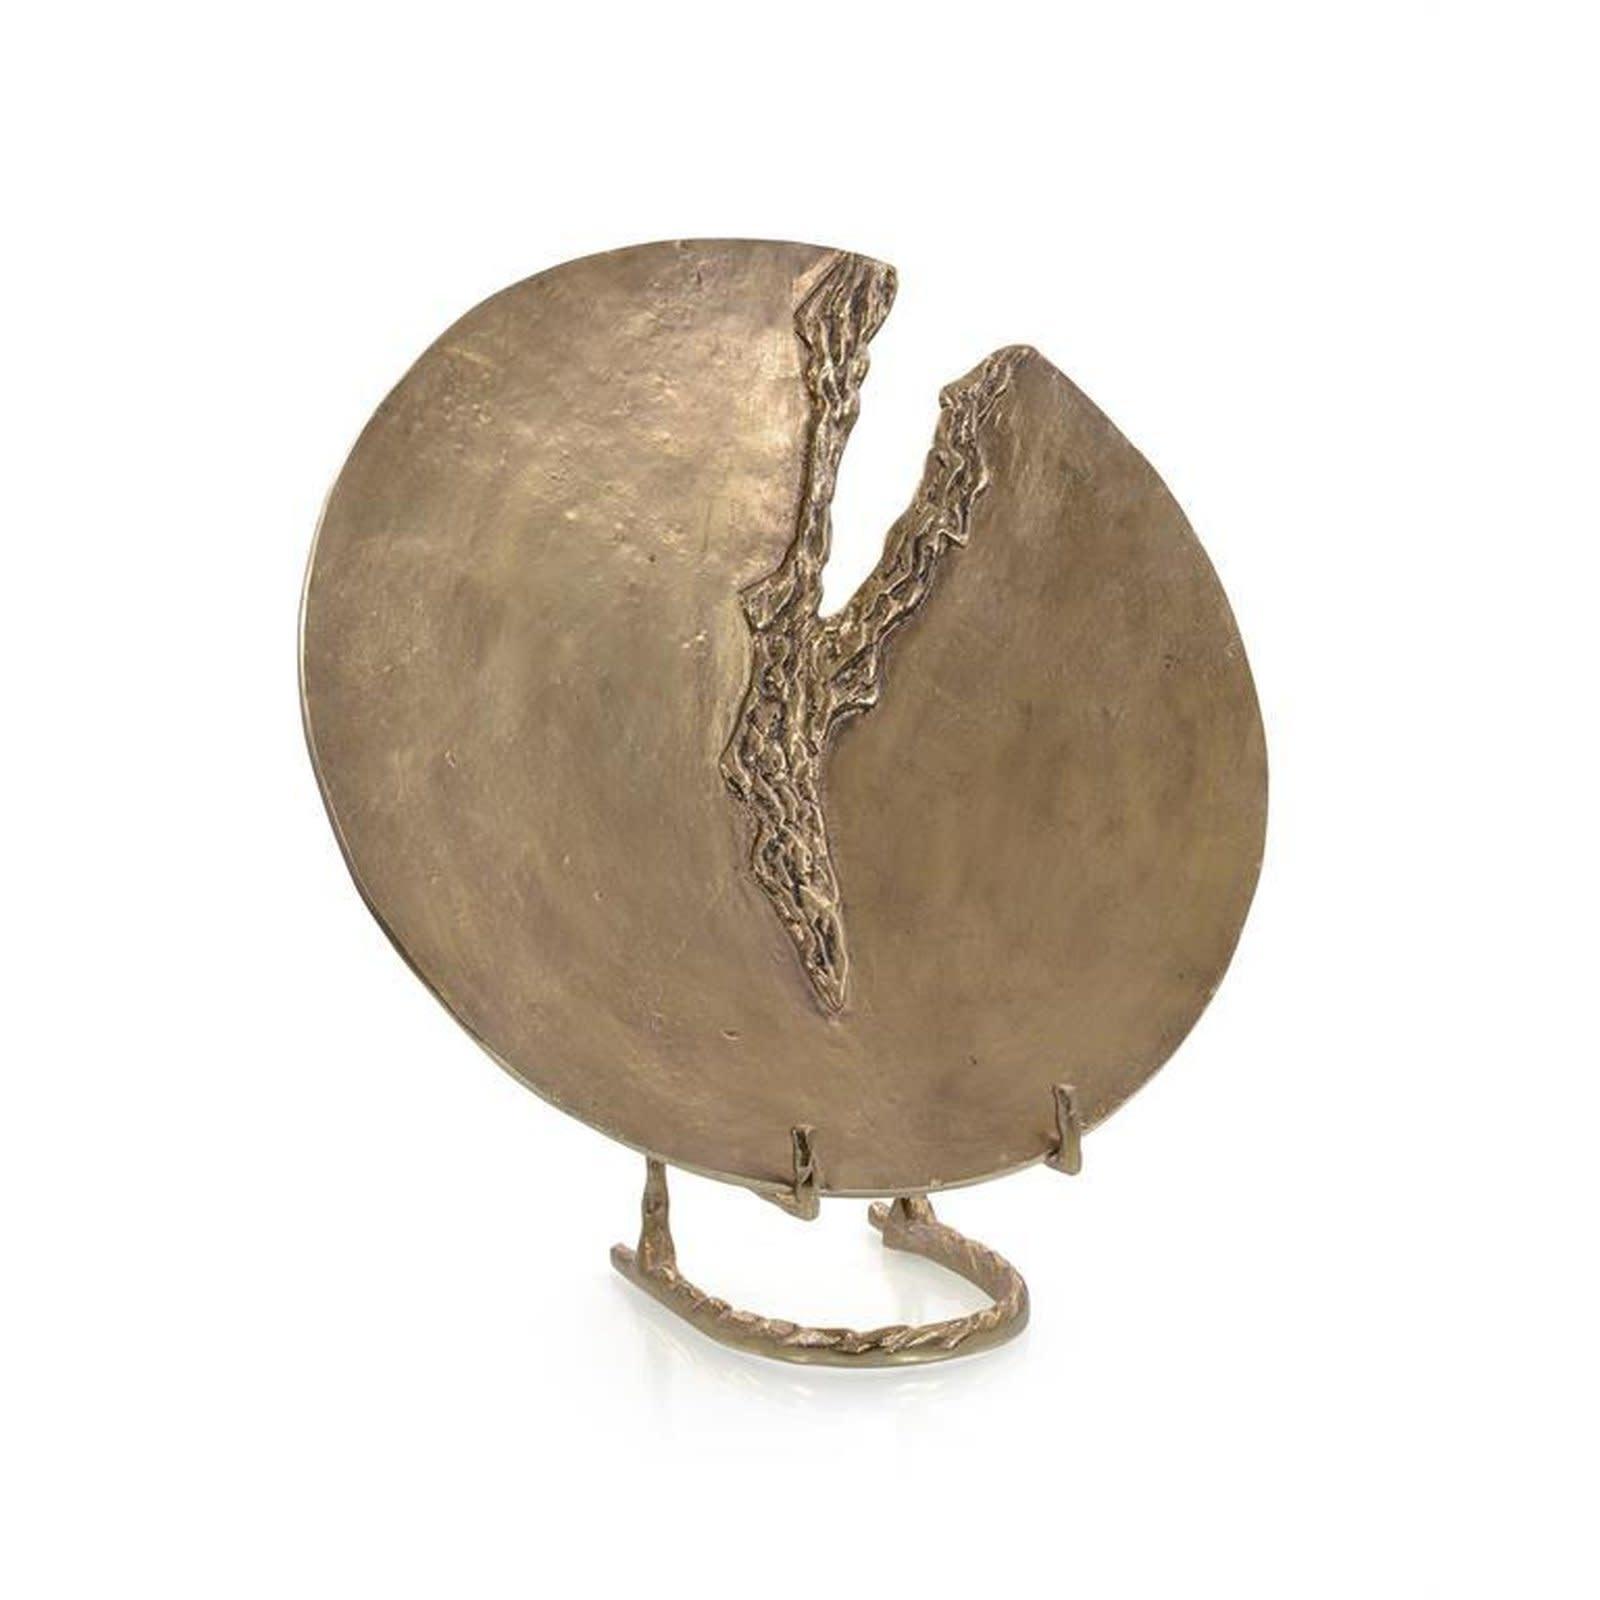 John Richard Hammered Brass Charger II